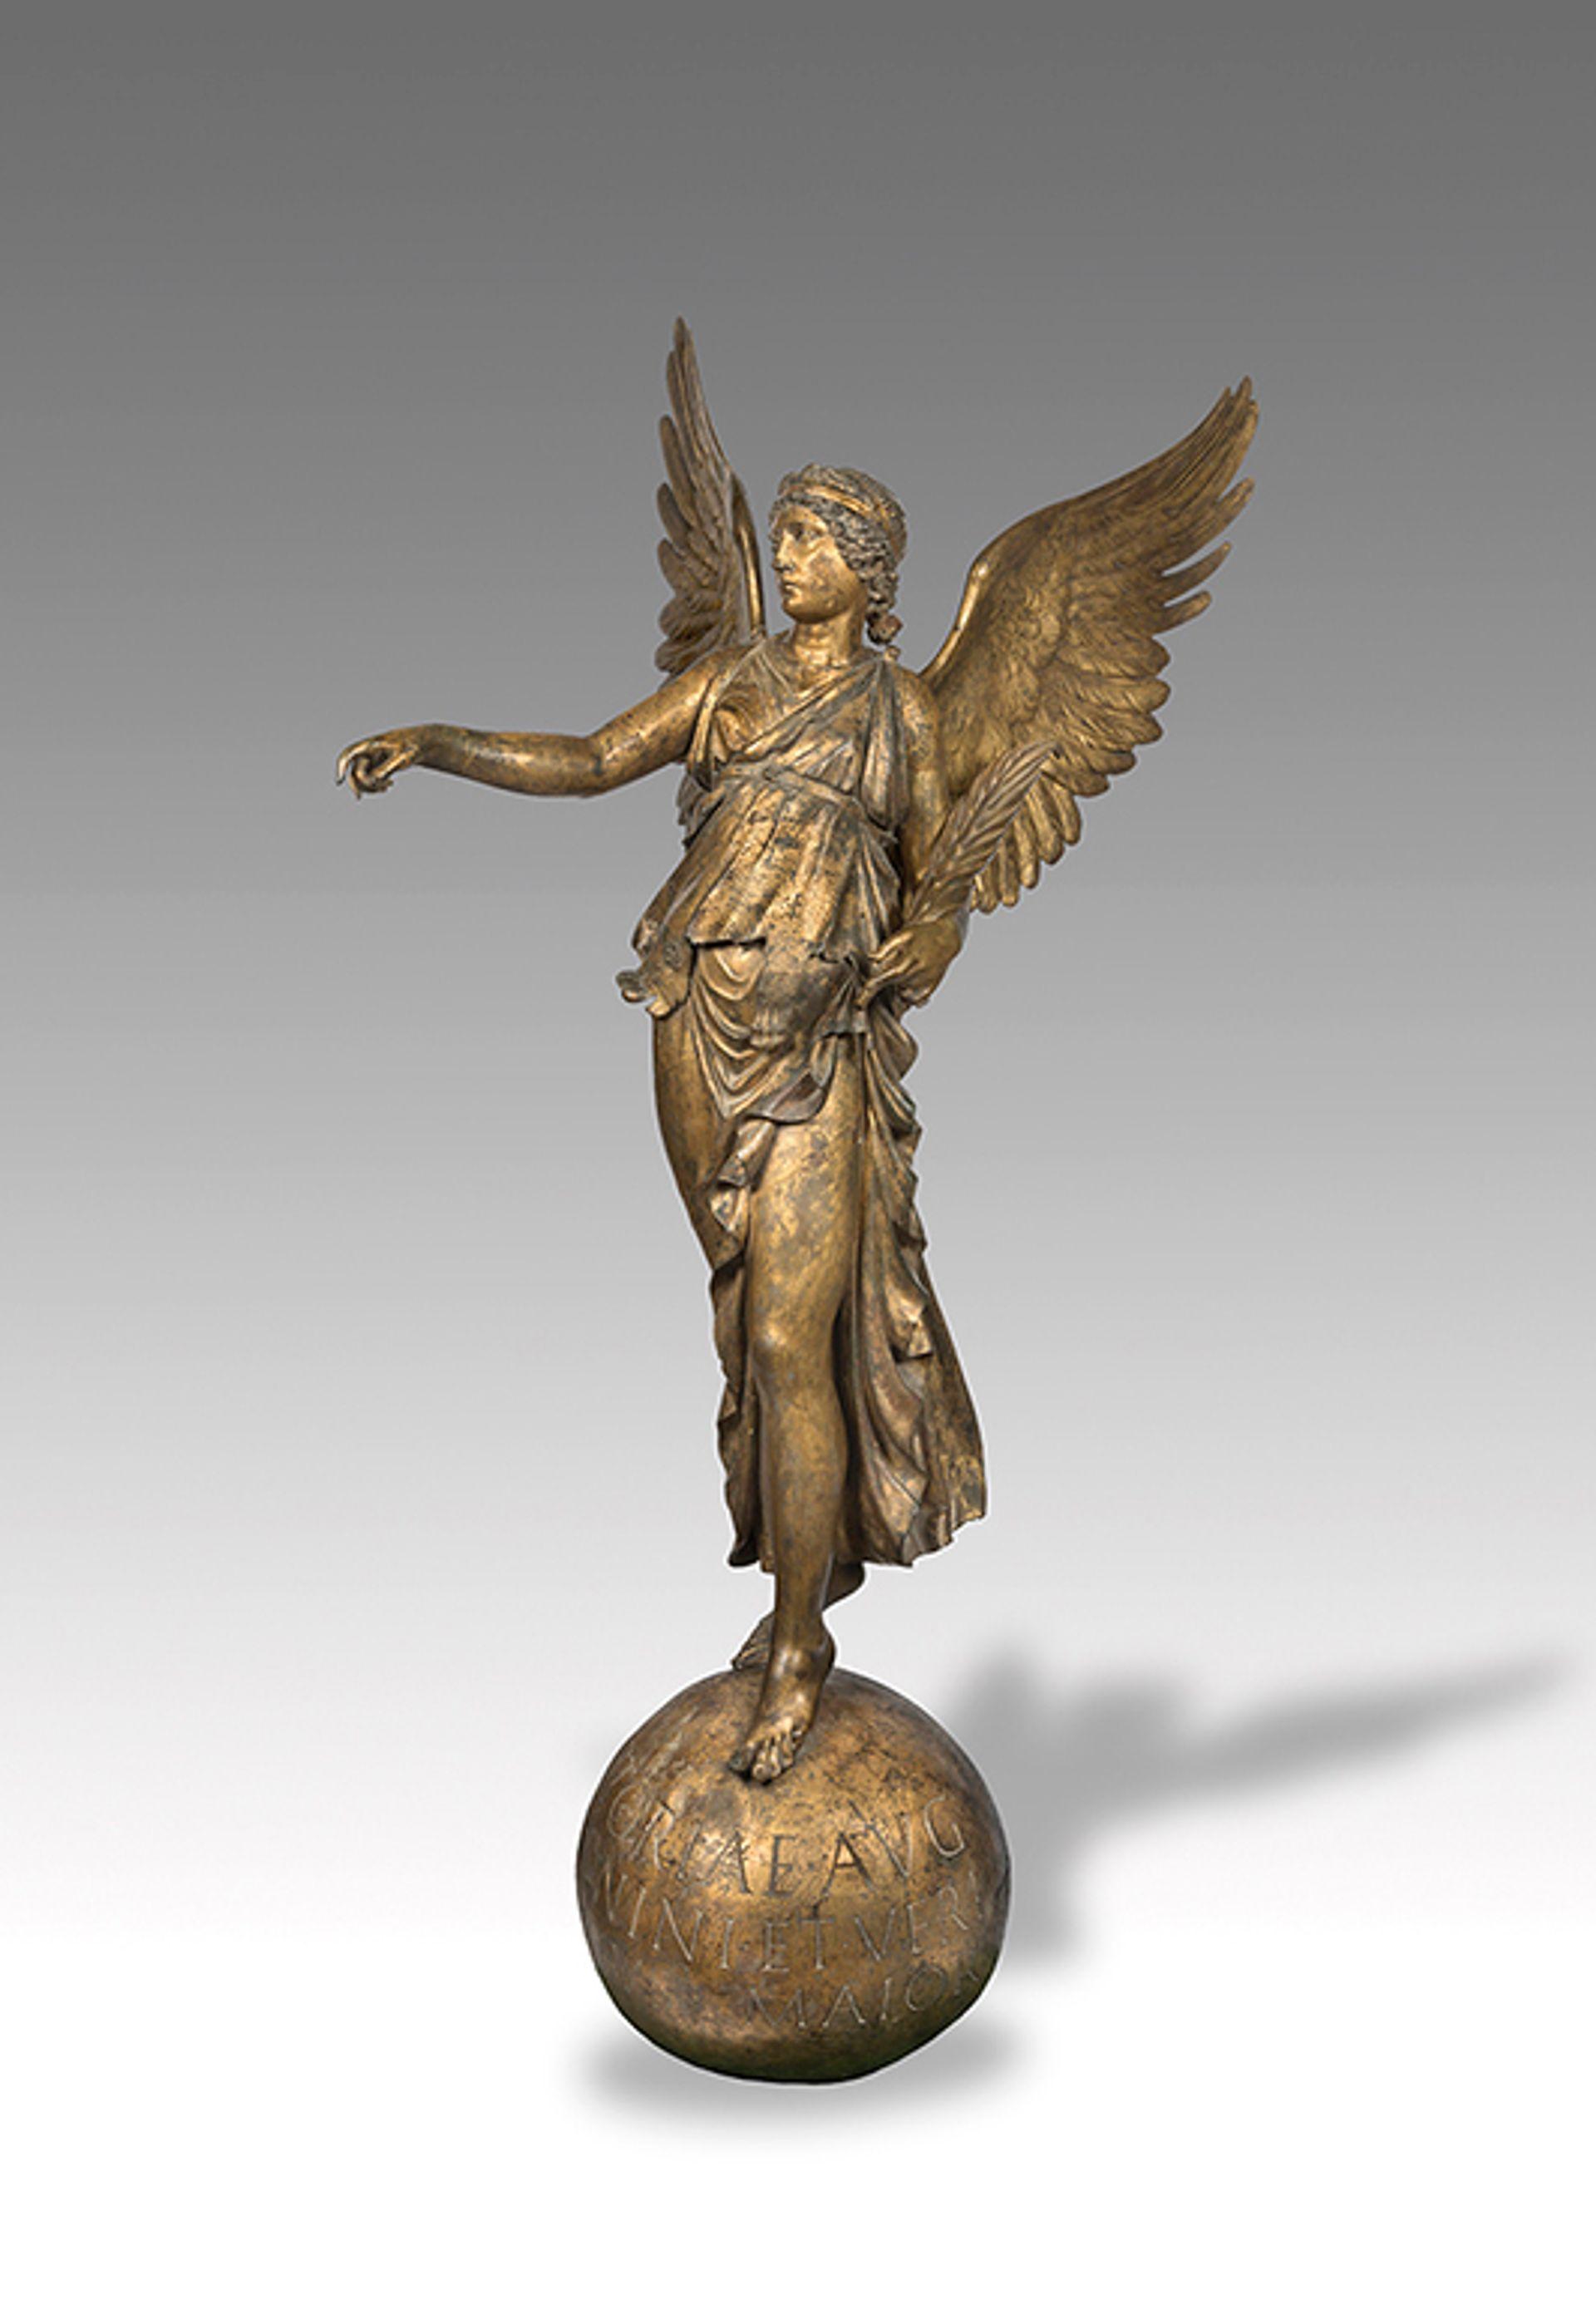 The Roman bronze known as Victoria of Calvatone State Hermitage Museum